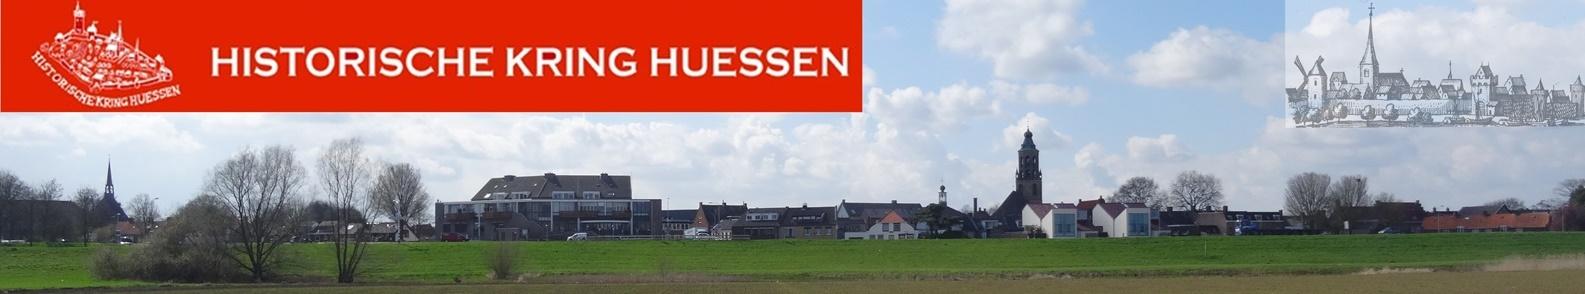 Historische Kring Huessen